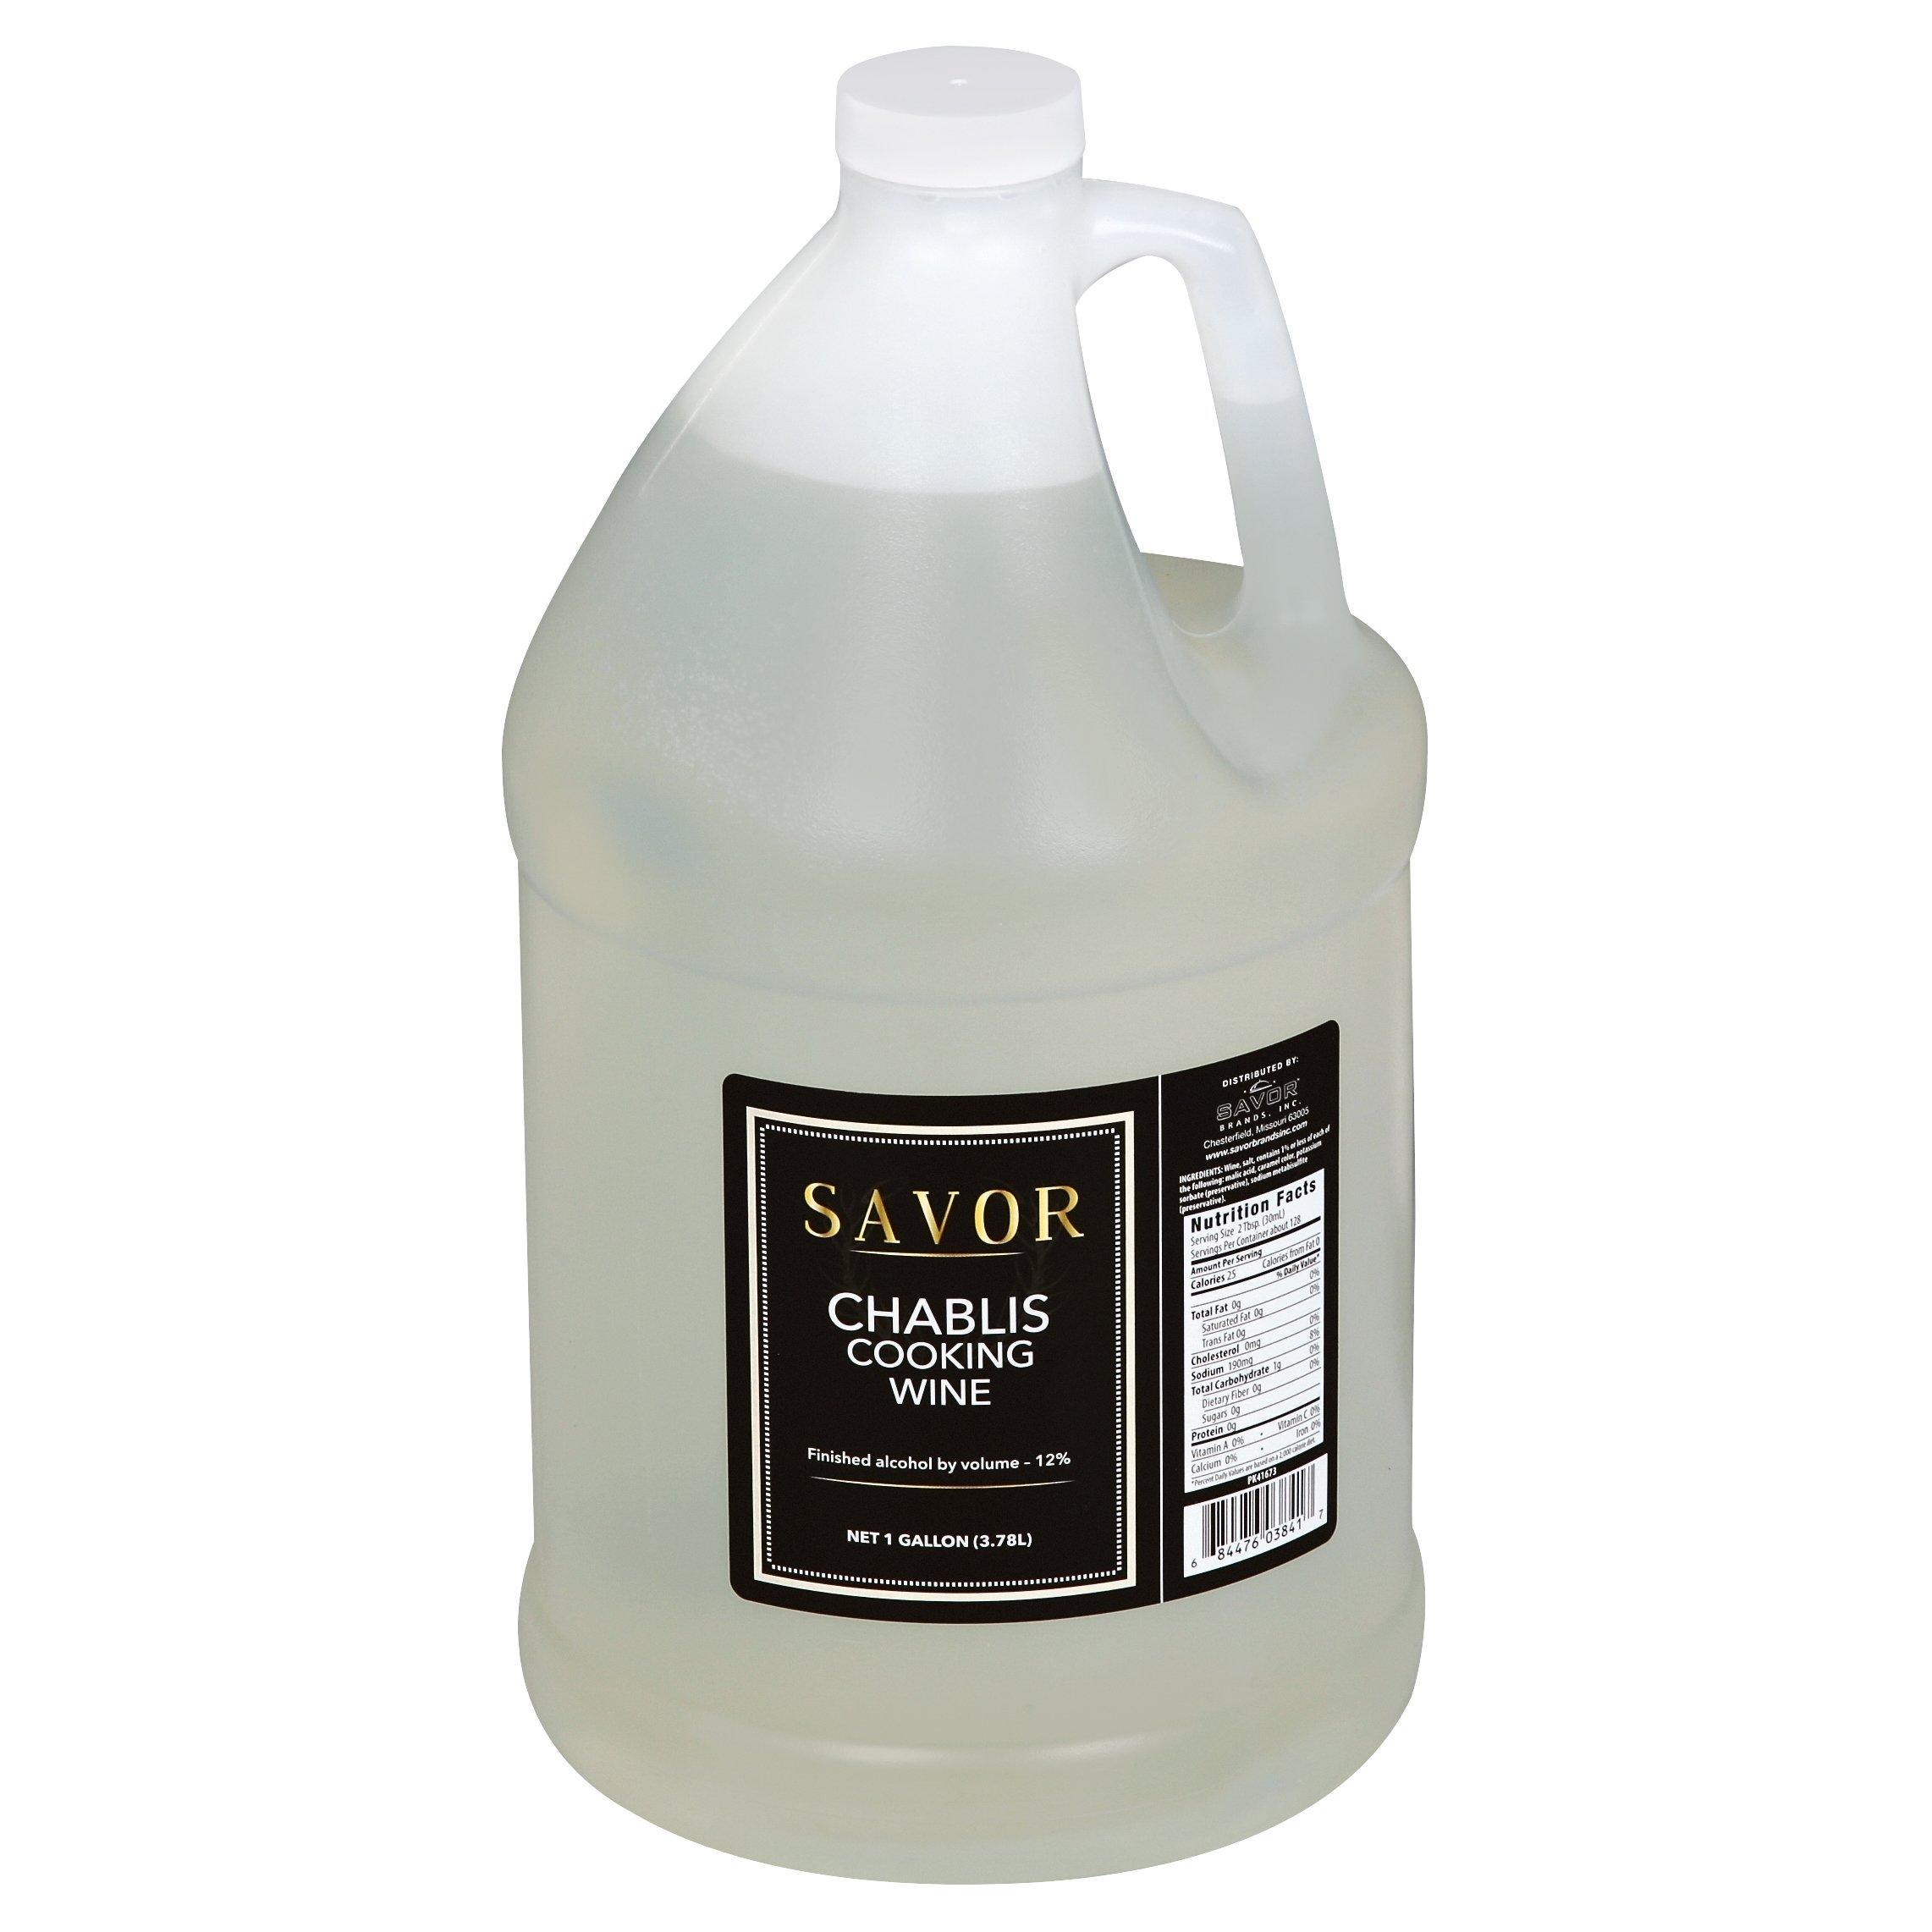 Savor, Chablis Cooking Wine 1 Gallon (4 count)